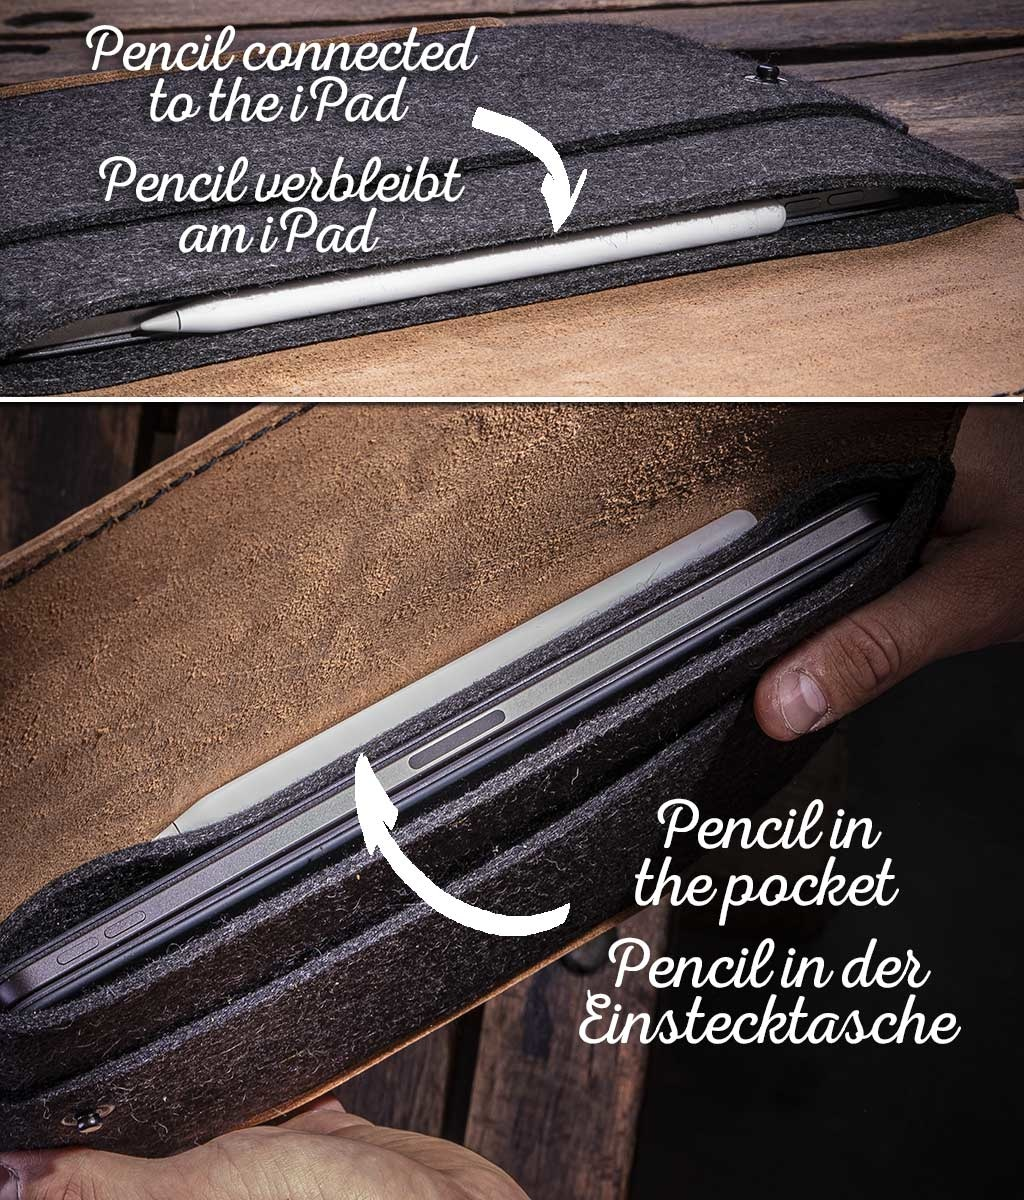 iPad Pro 11 12.9 Air 10.5 10.2 Hülle Leder Filz, Tasche WERKZEUGTASCHE